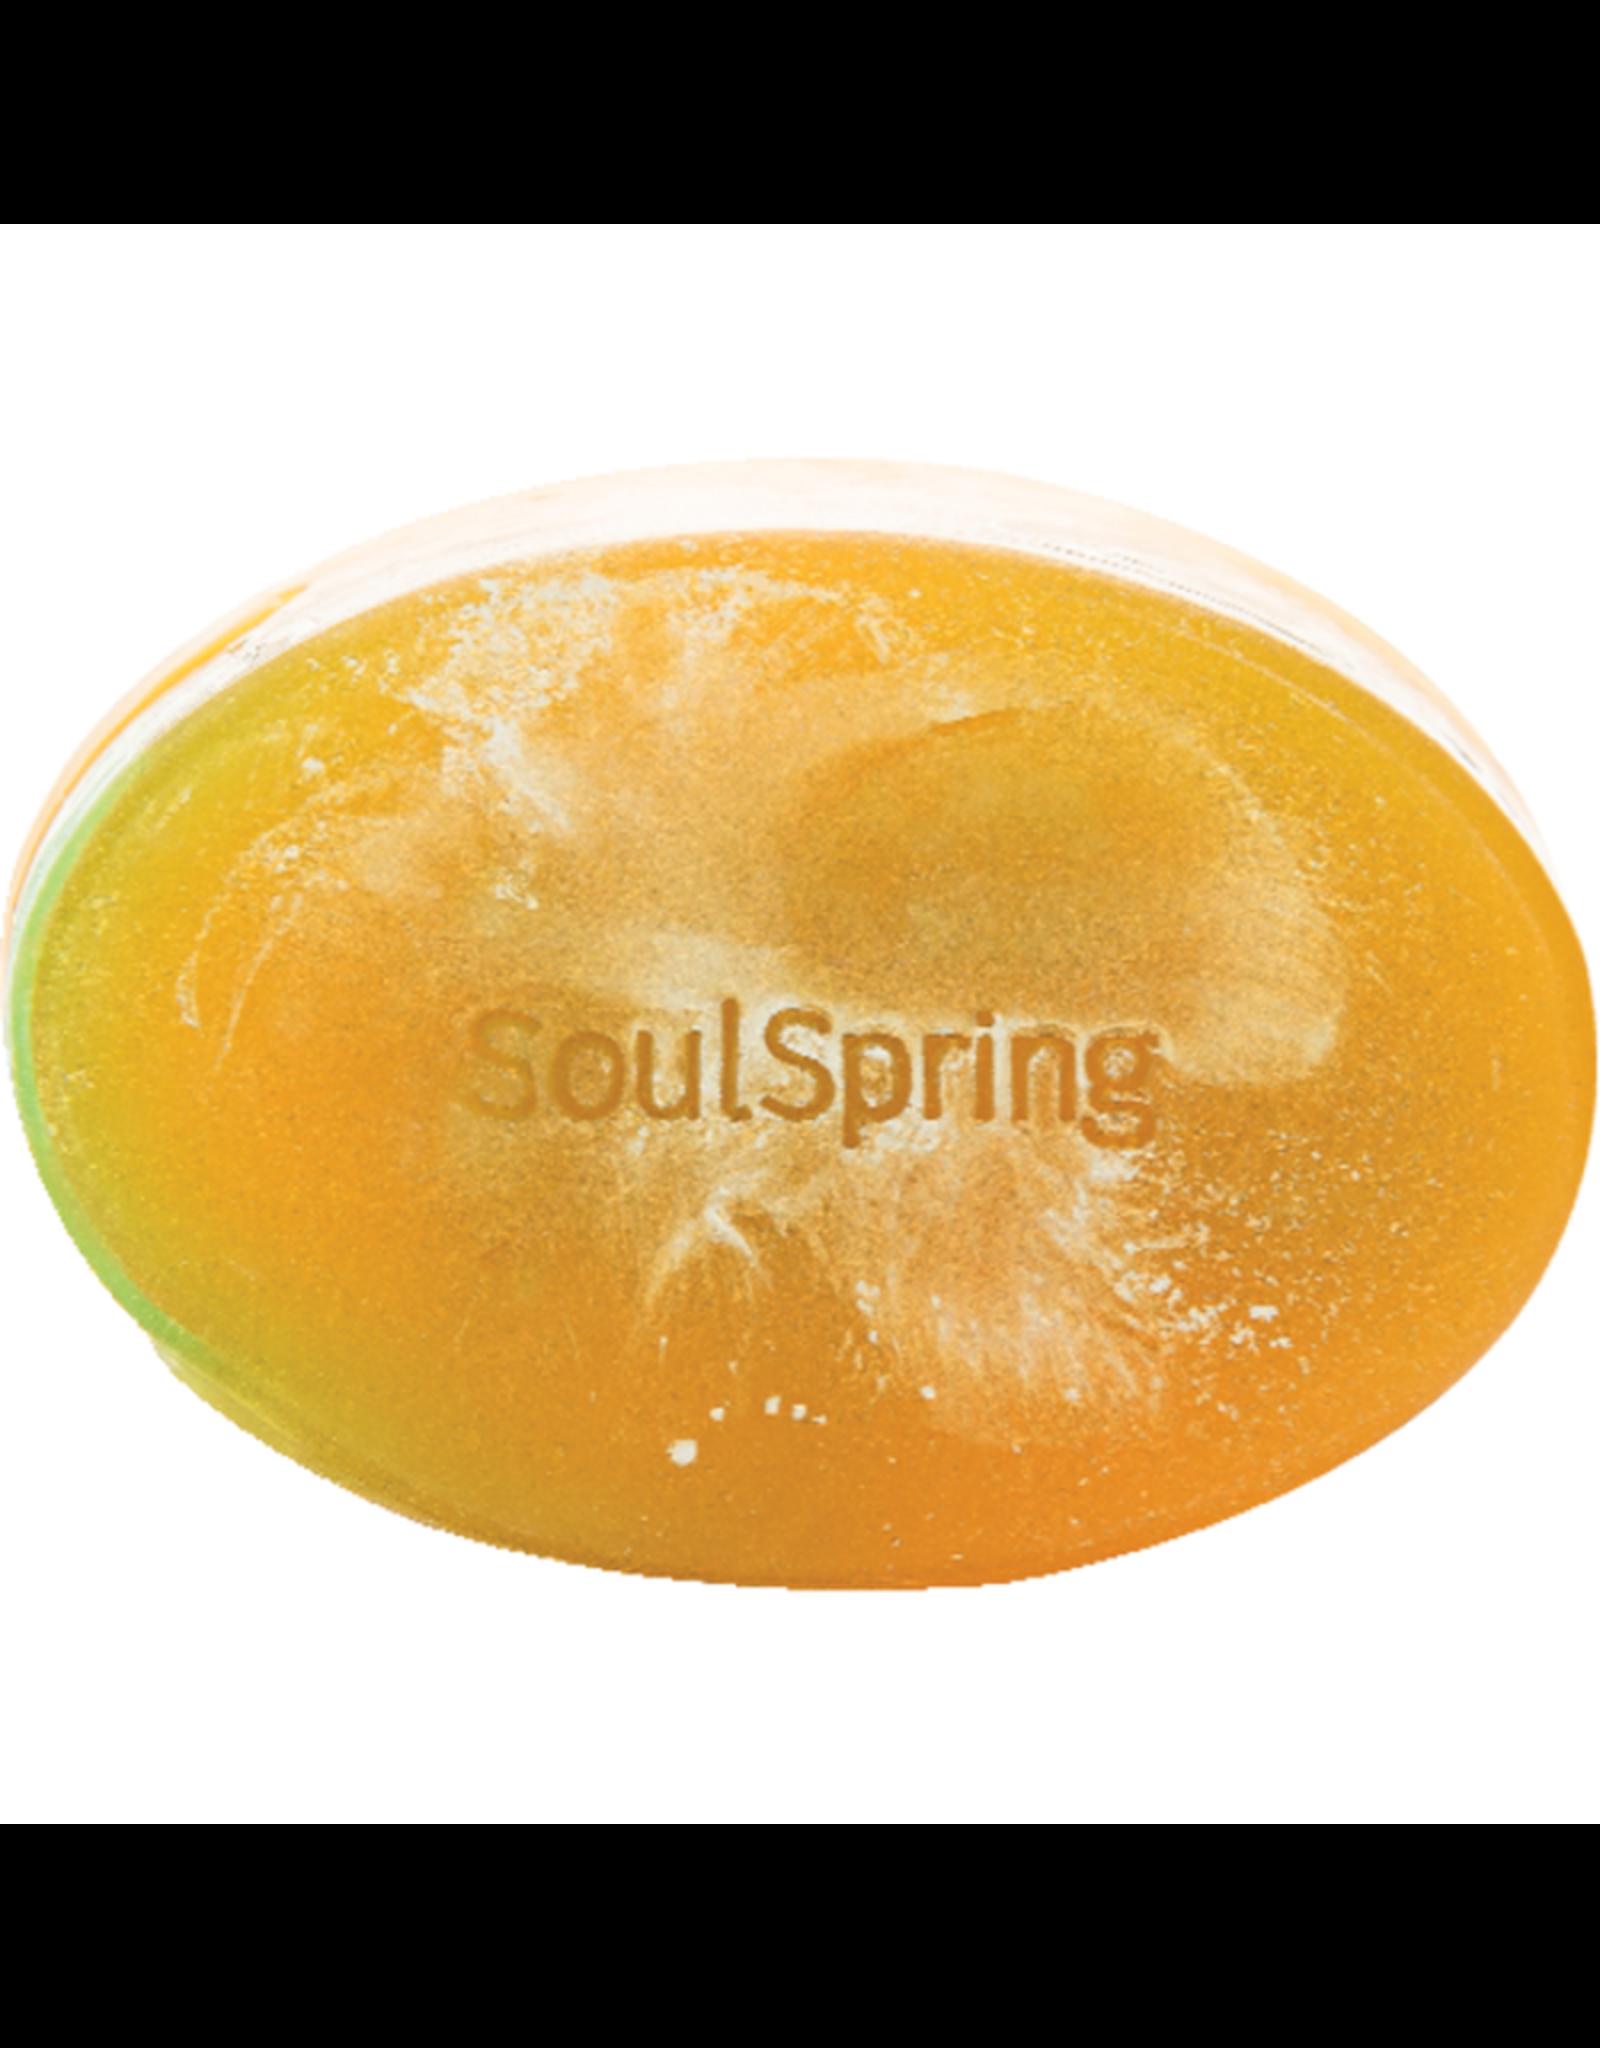 Soul Spring Stimulating CBD Bath Bar